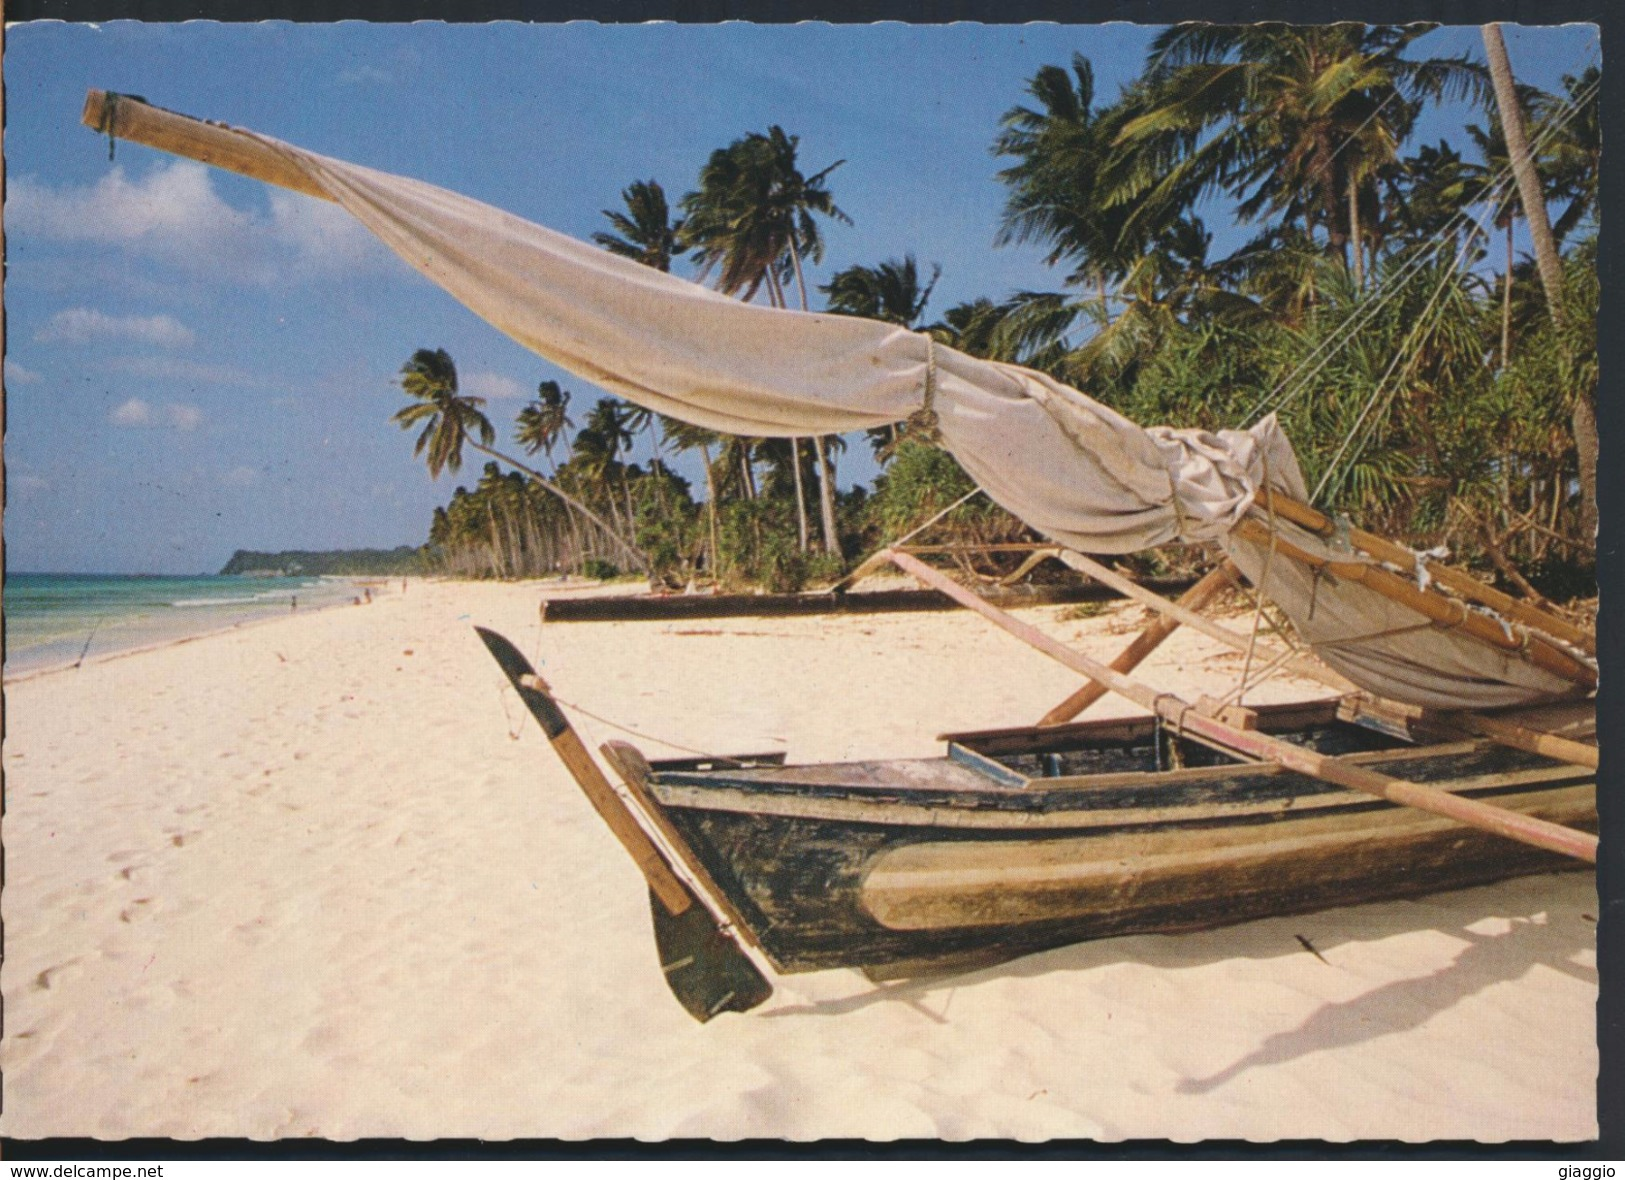 °°° 3975 - PHILIPPINES - BORACAY ISLAND °°° - Filippine